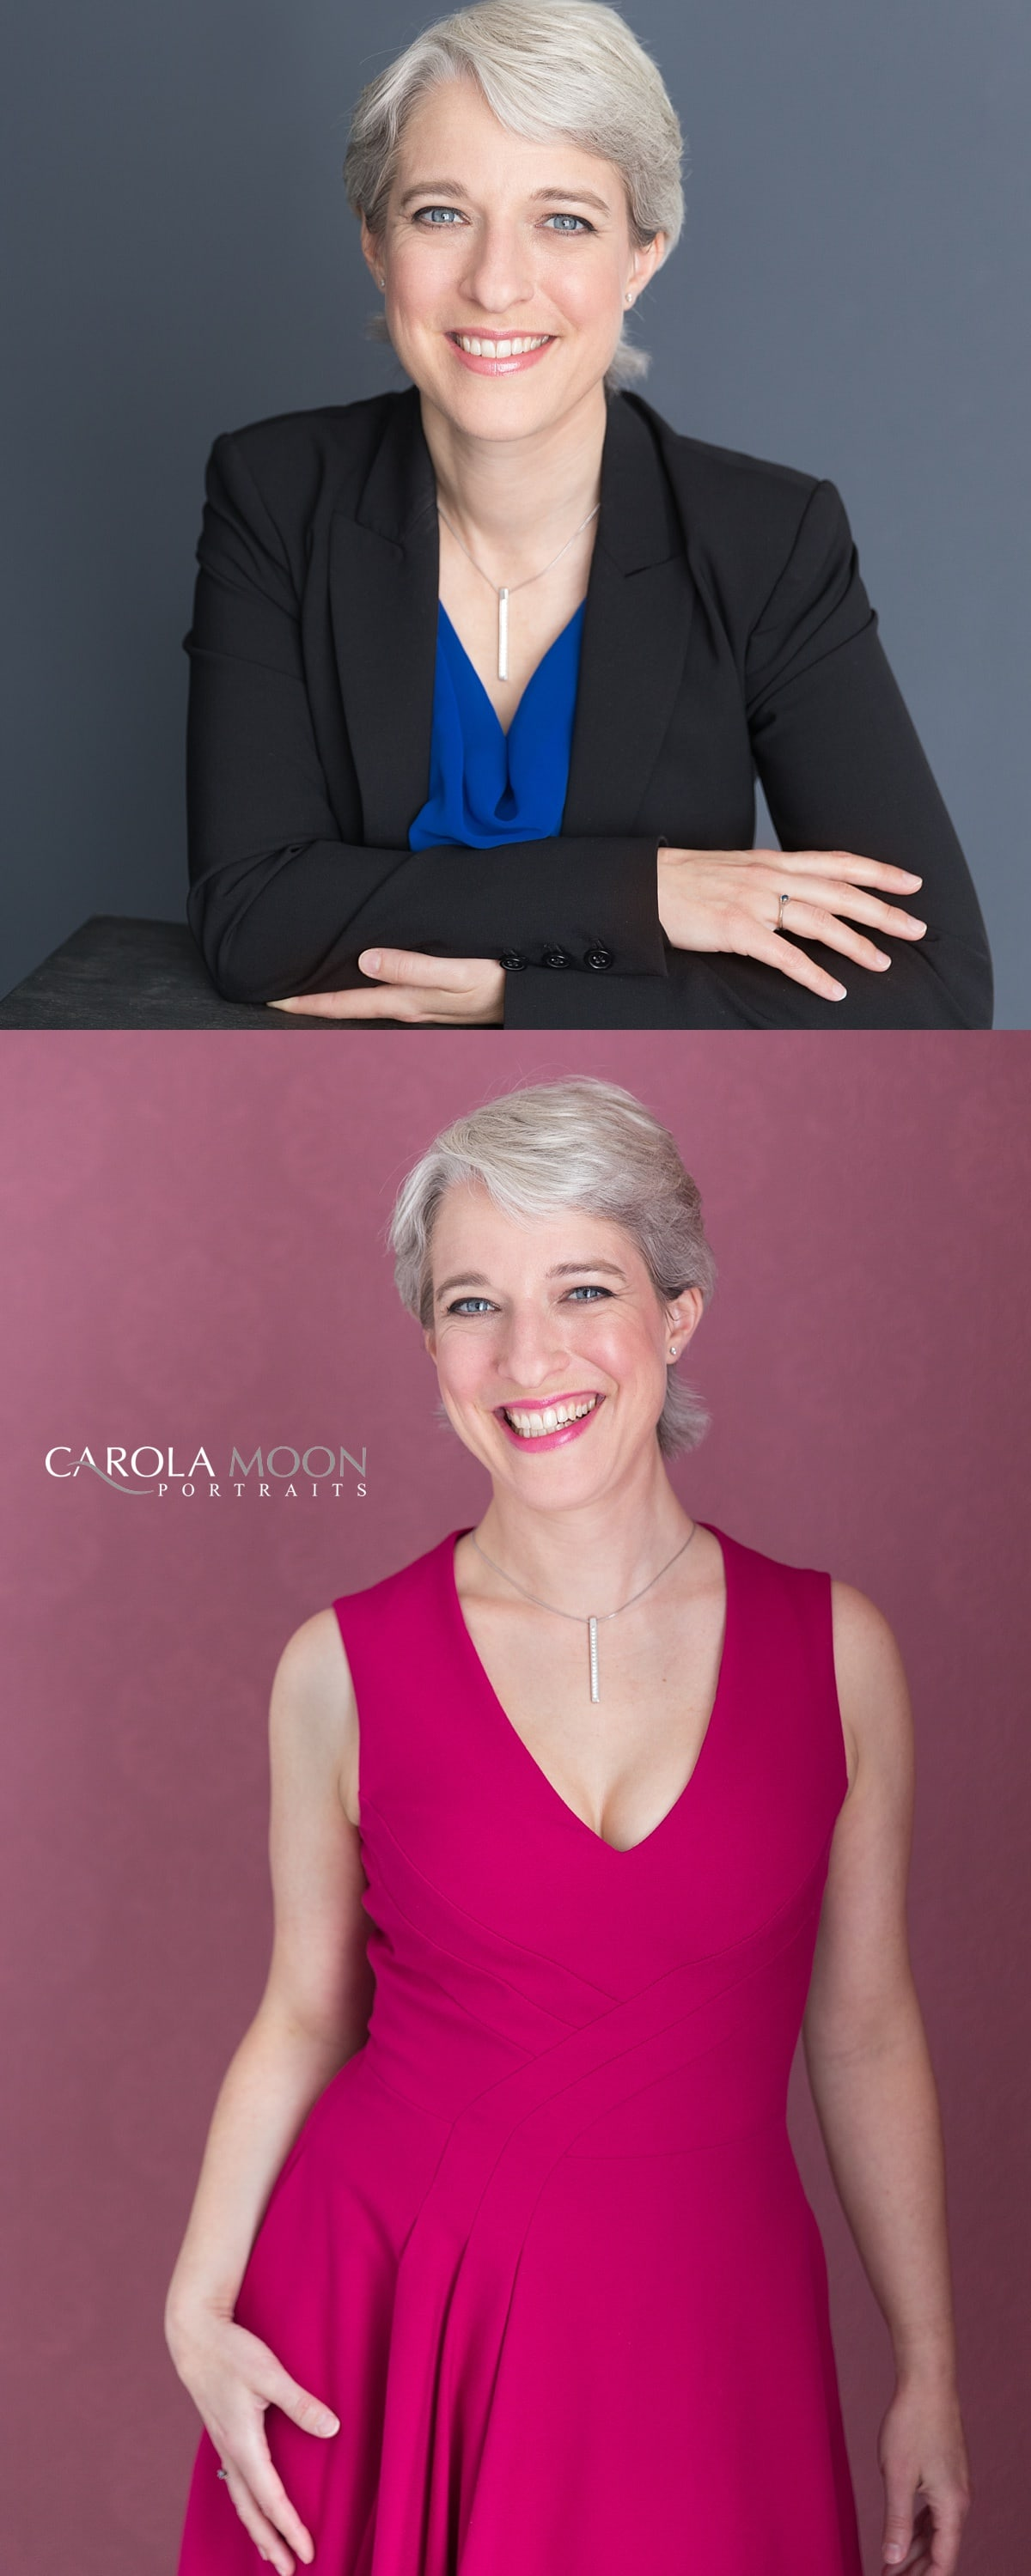 Author Portrait Speaker Networking event Carola Moon Portraits in Wallingford Oxon UK GiB